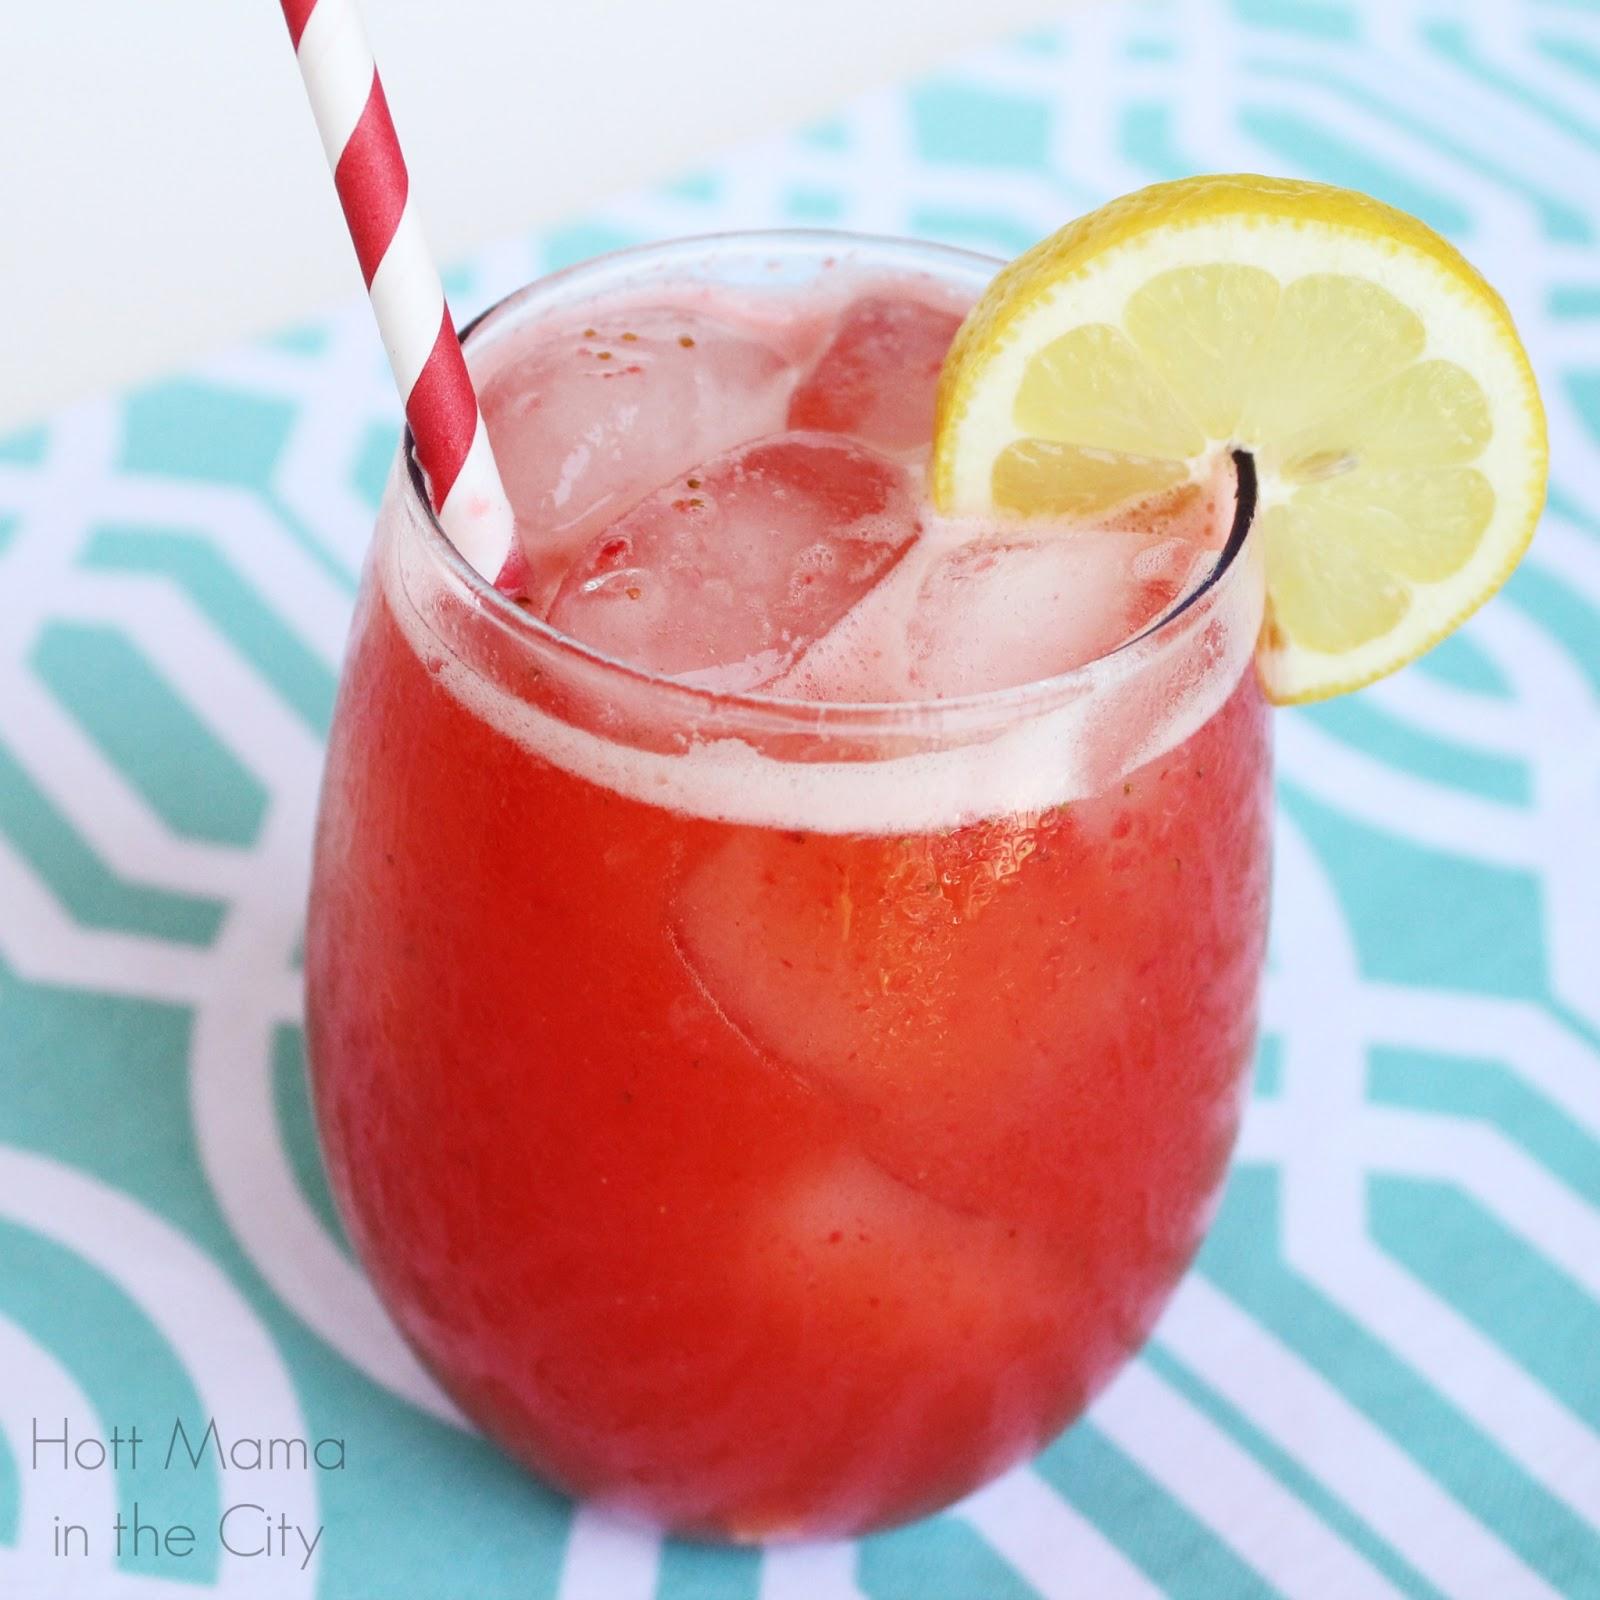 Strawberry Mango lemonade